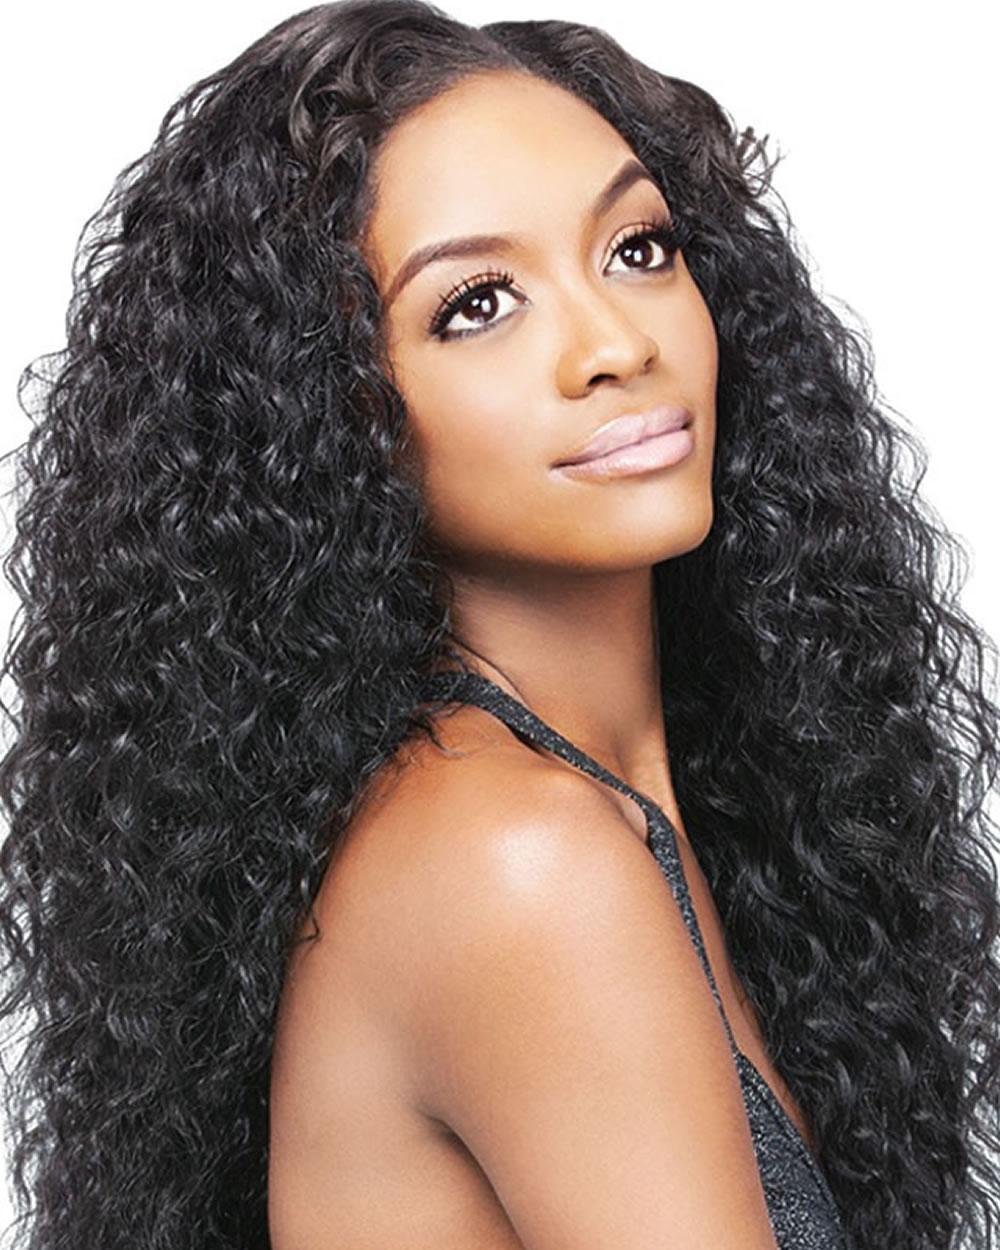 ShortNatural Hairstyles 2019 -African American Girl 5